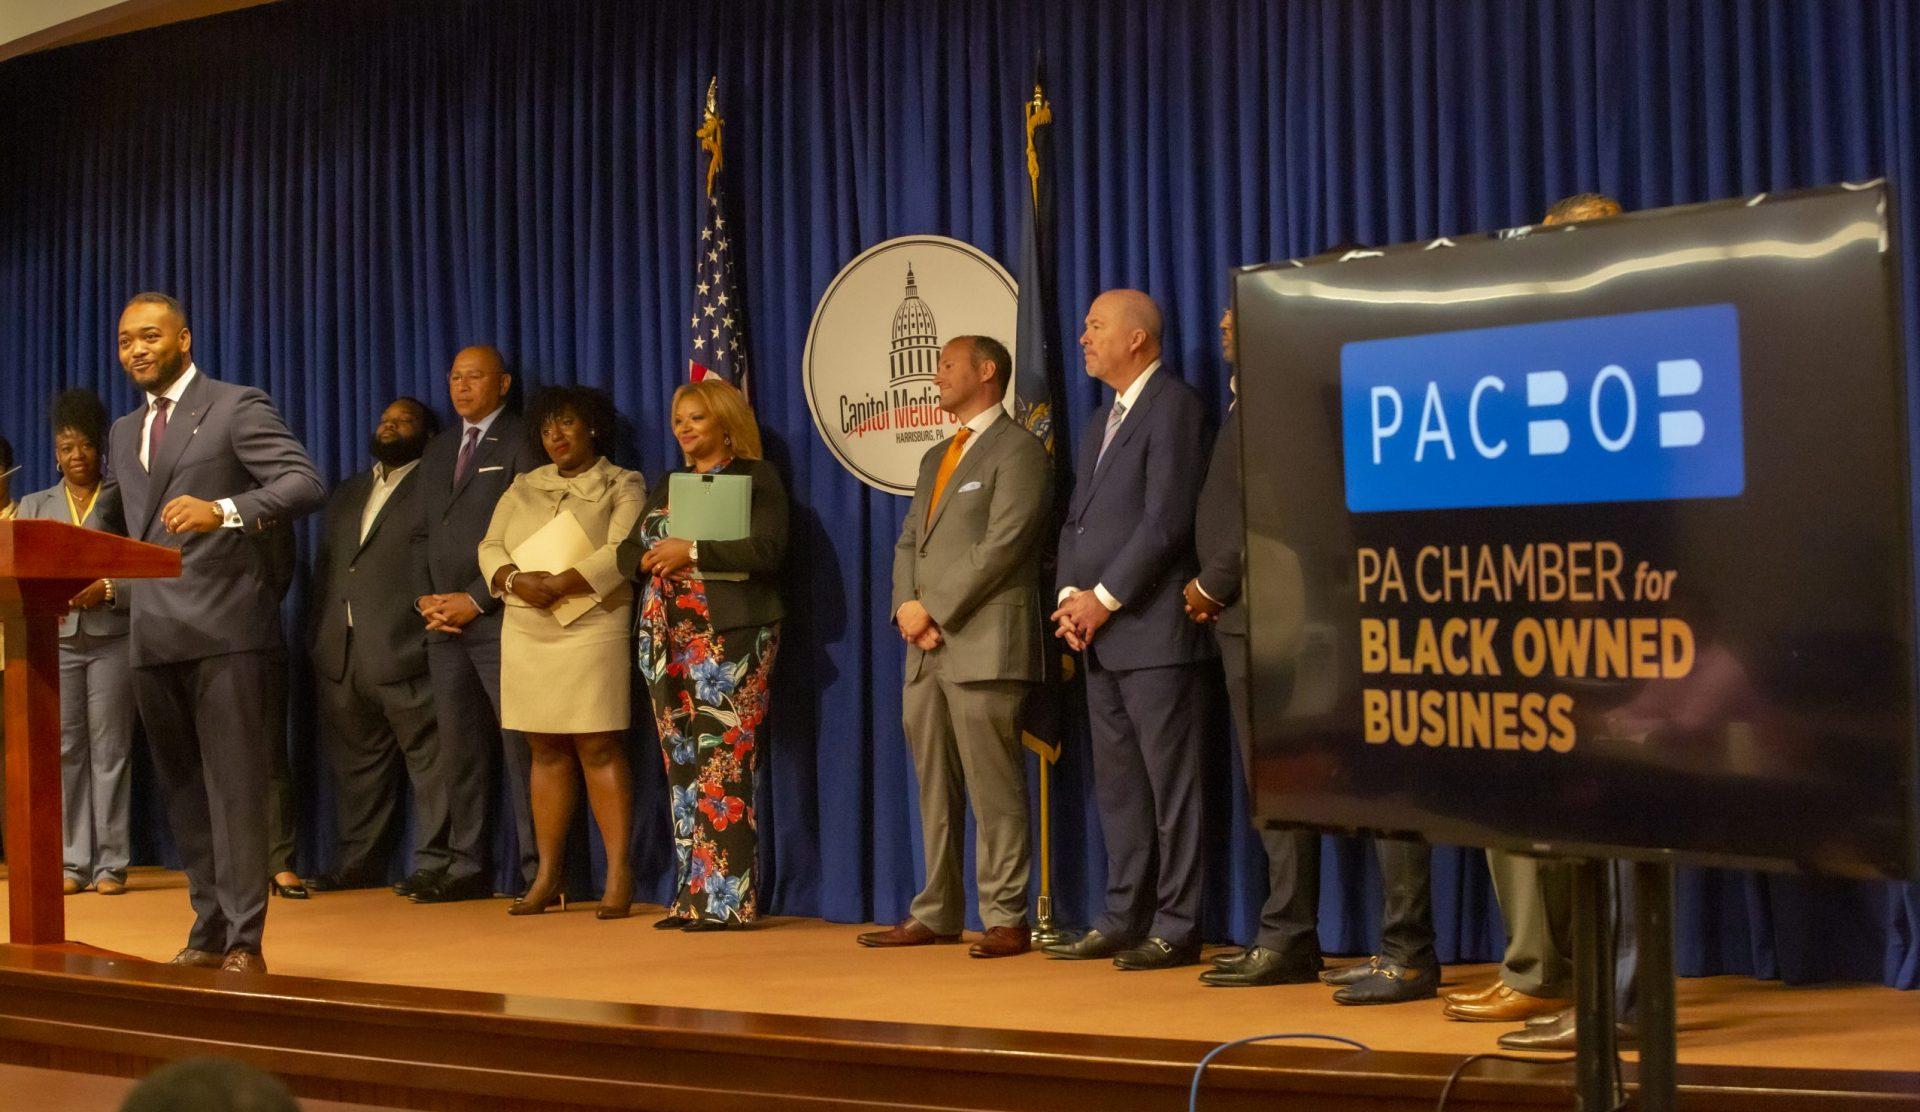 Pennsylvania Chamber of Black-Owned Business Provides Support to Black Entrepreneurs